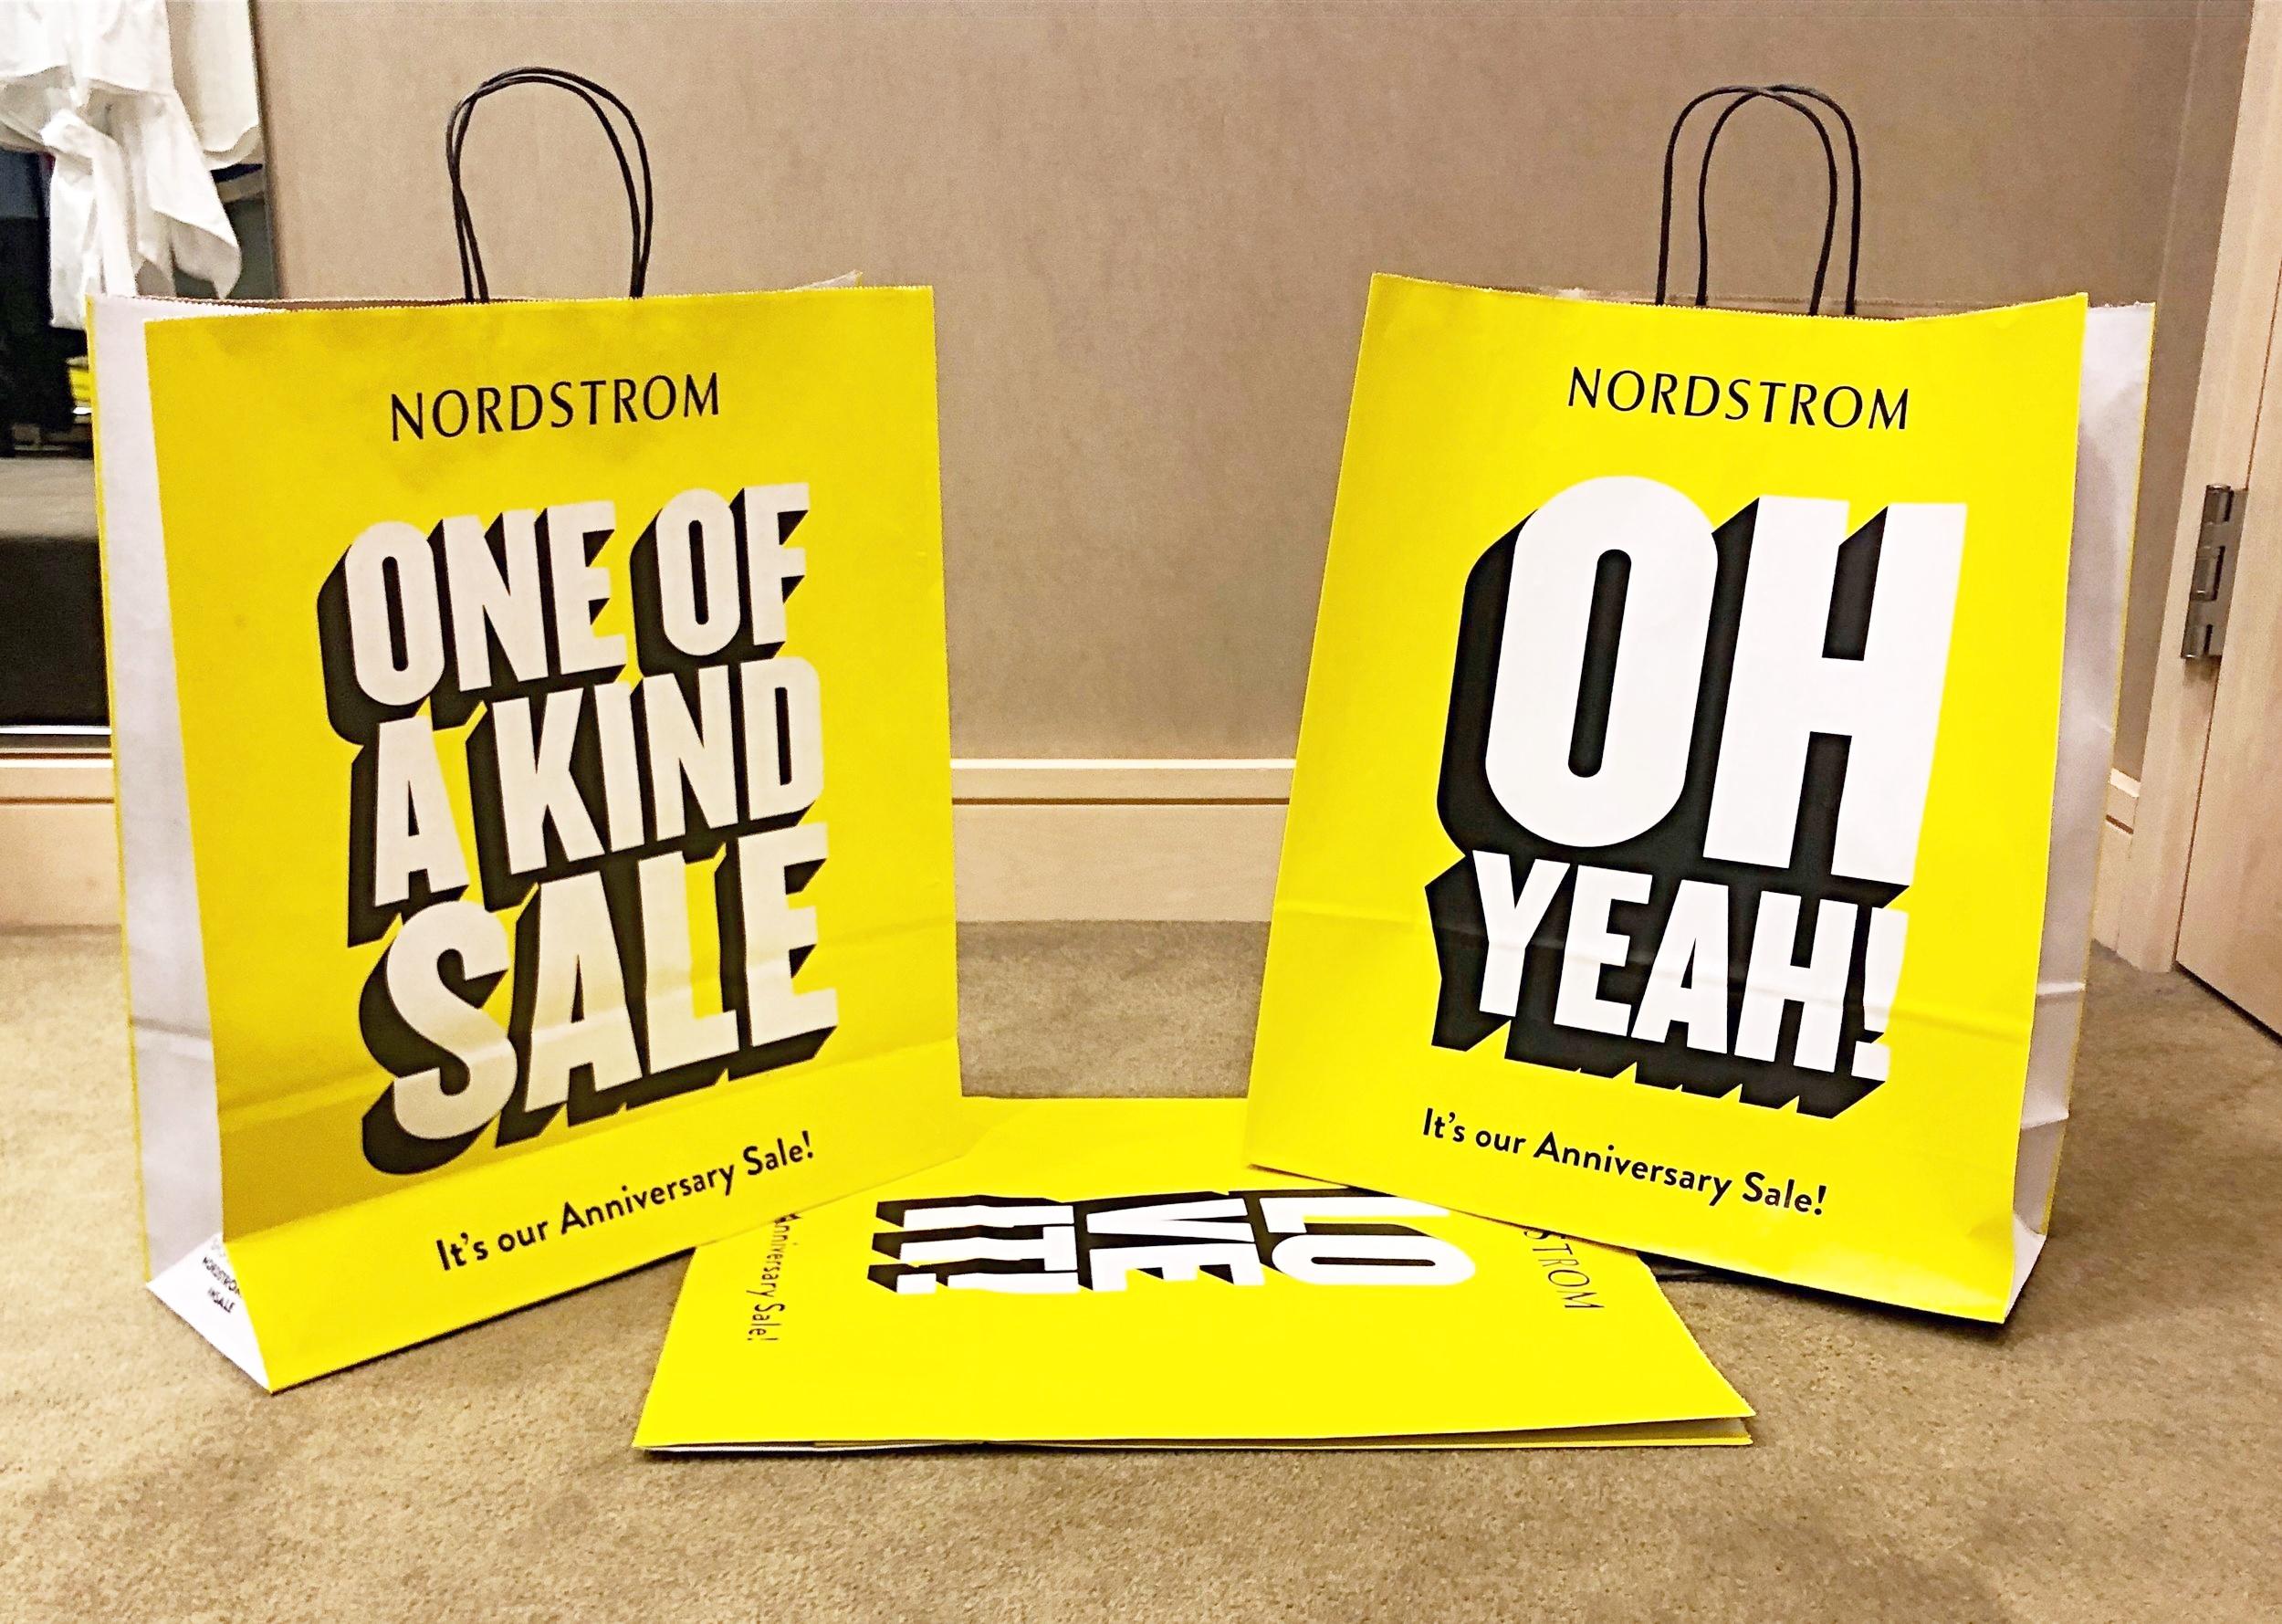 nordstrom-anniversary-sale.JPG